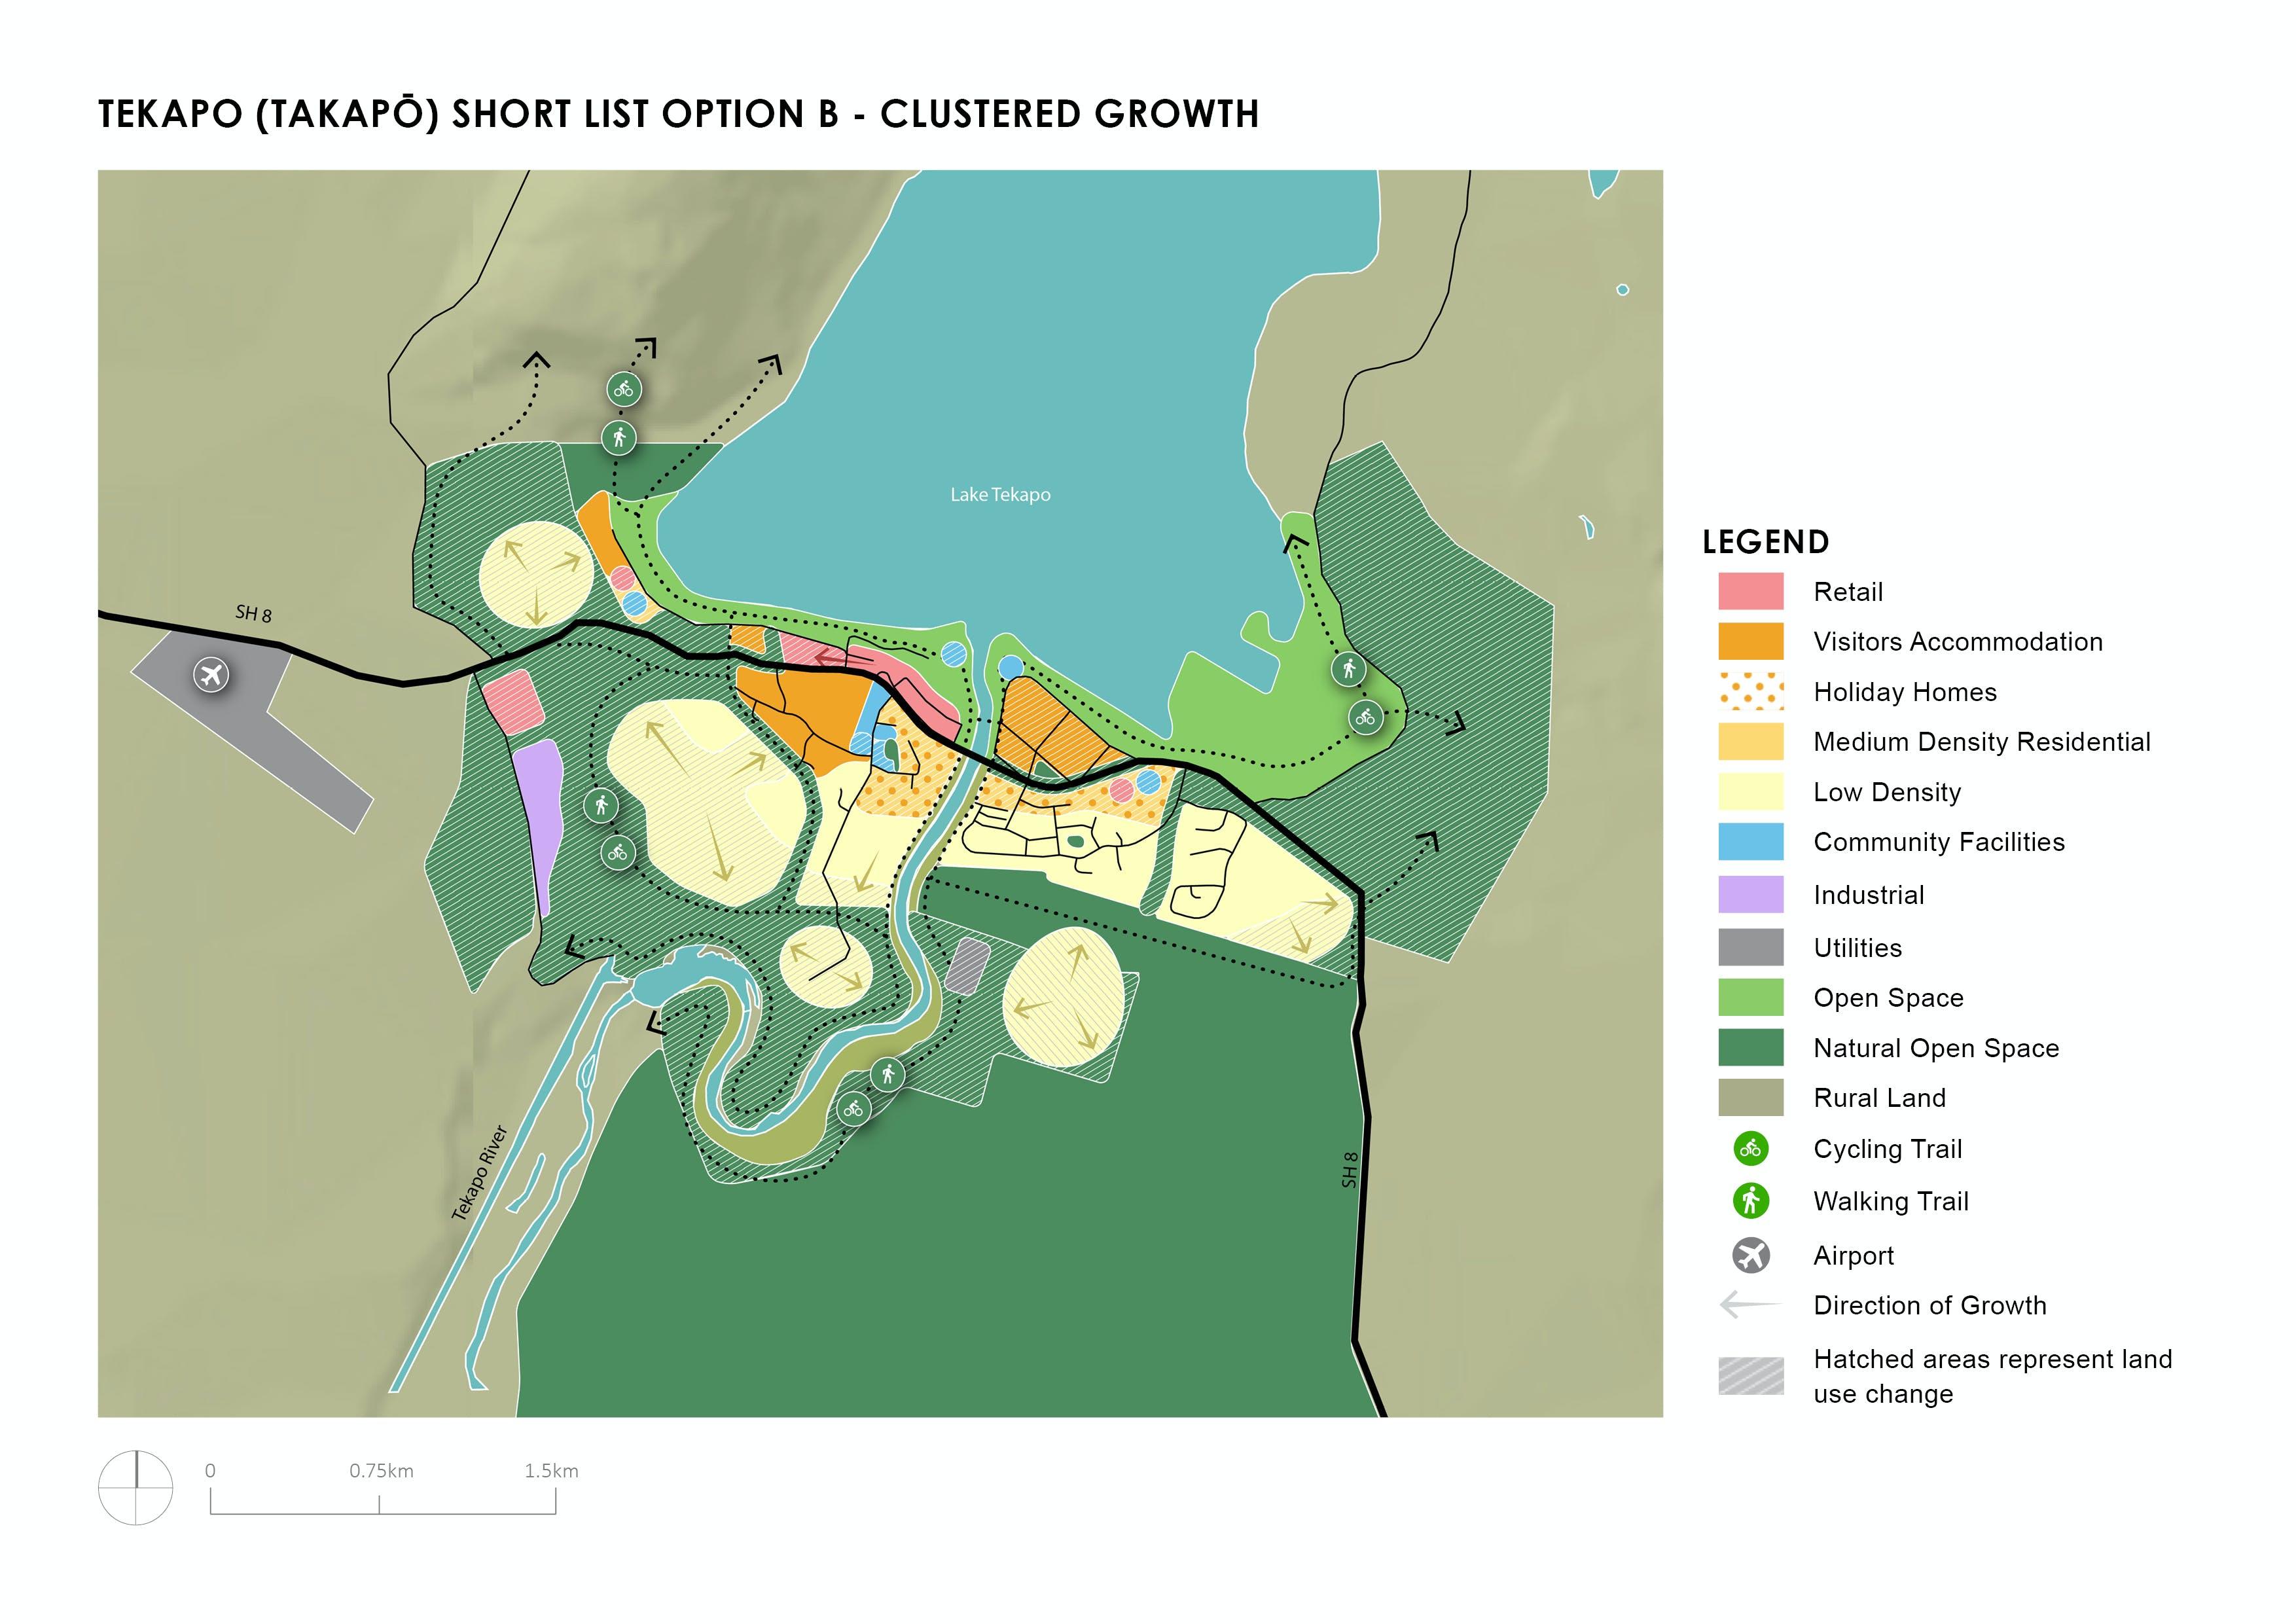 Tekapo Shortlist Option B - Clustered Growth